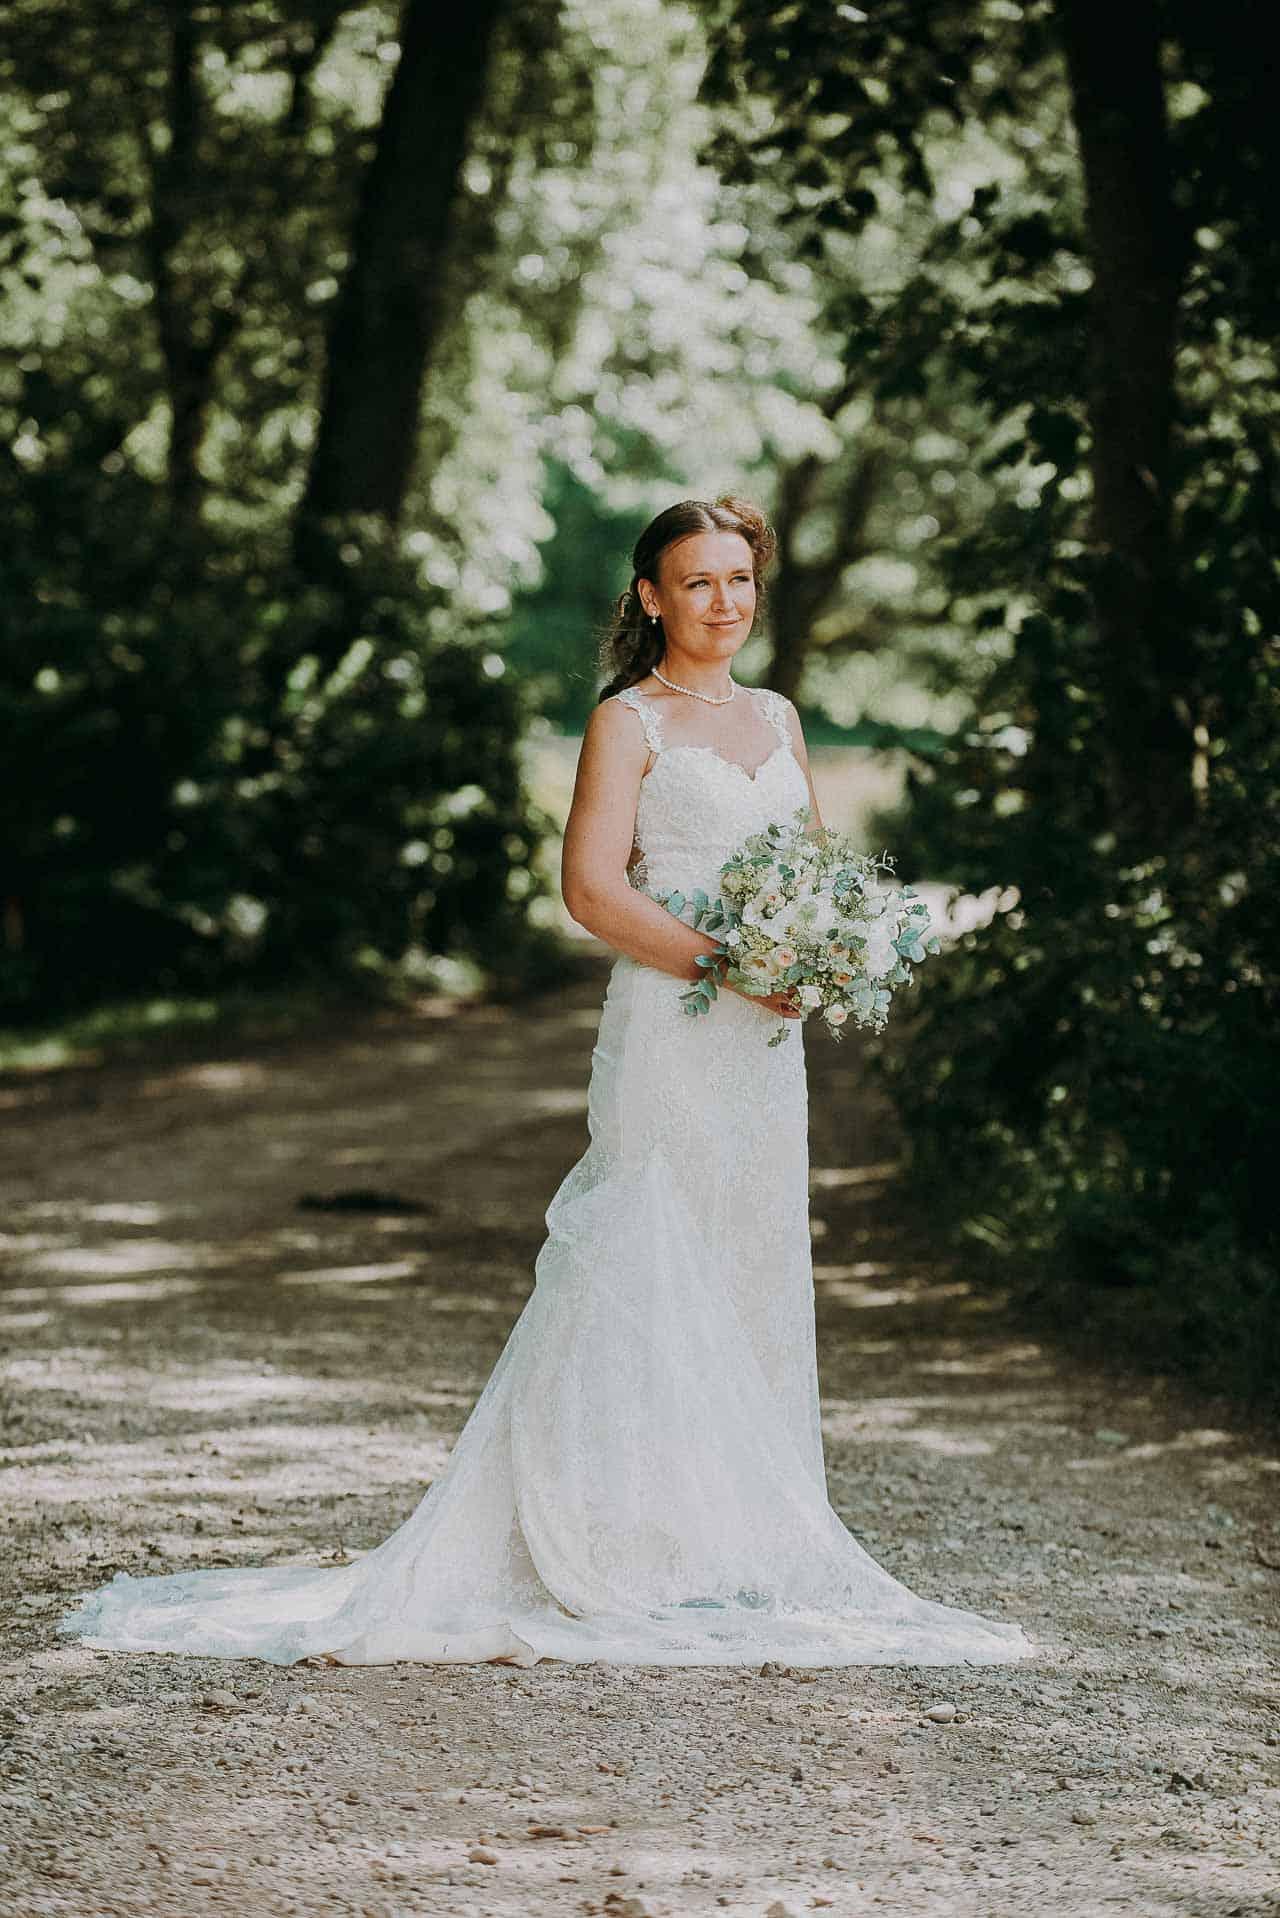 Brudekjoler – find din brudekjole til den store dag her